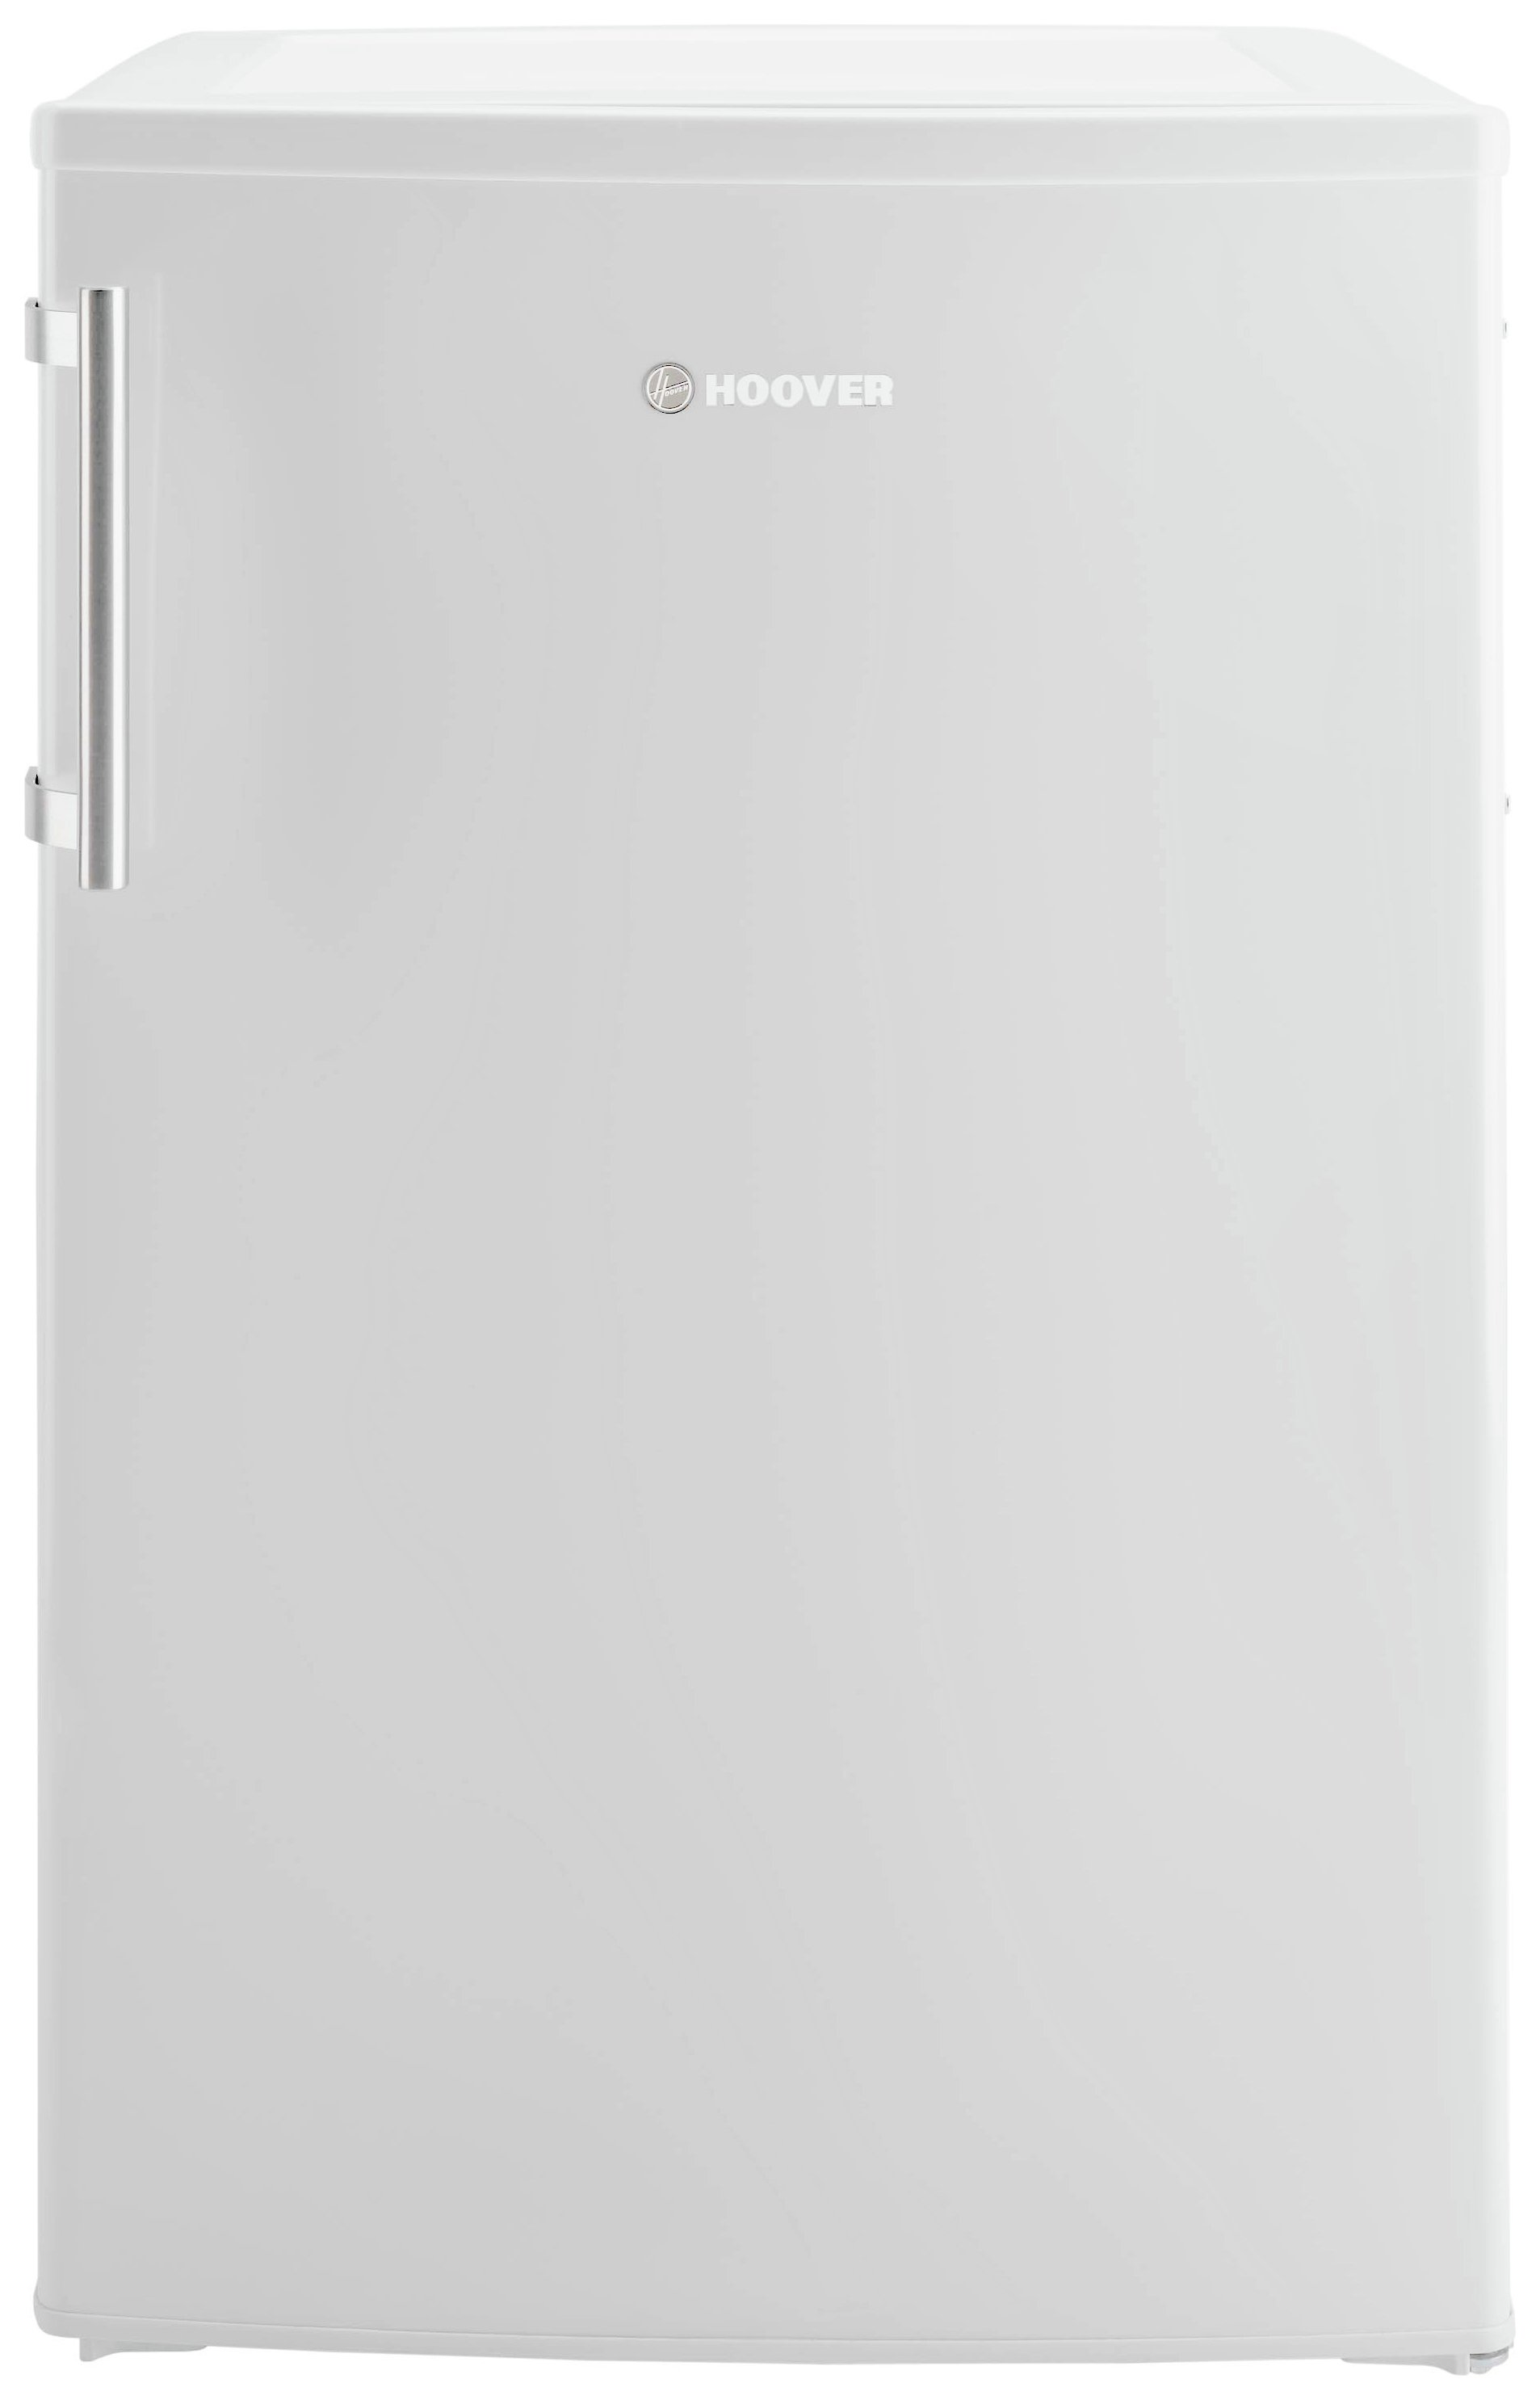 Hoover - HVTLU542WHK - Under Counter - Freezer - White